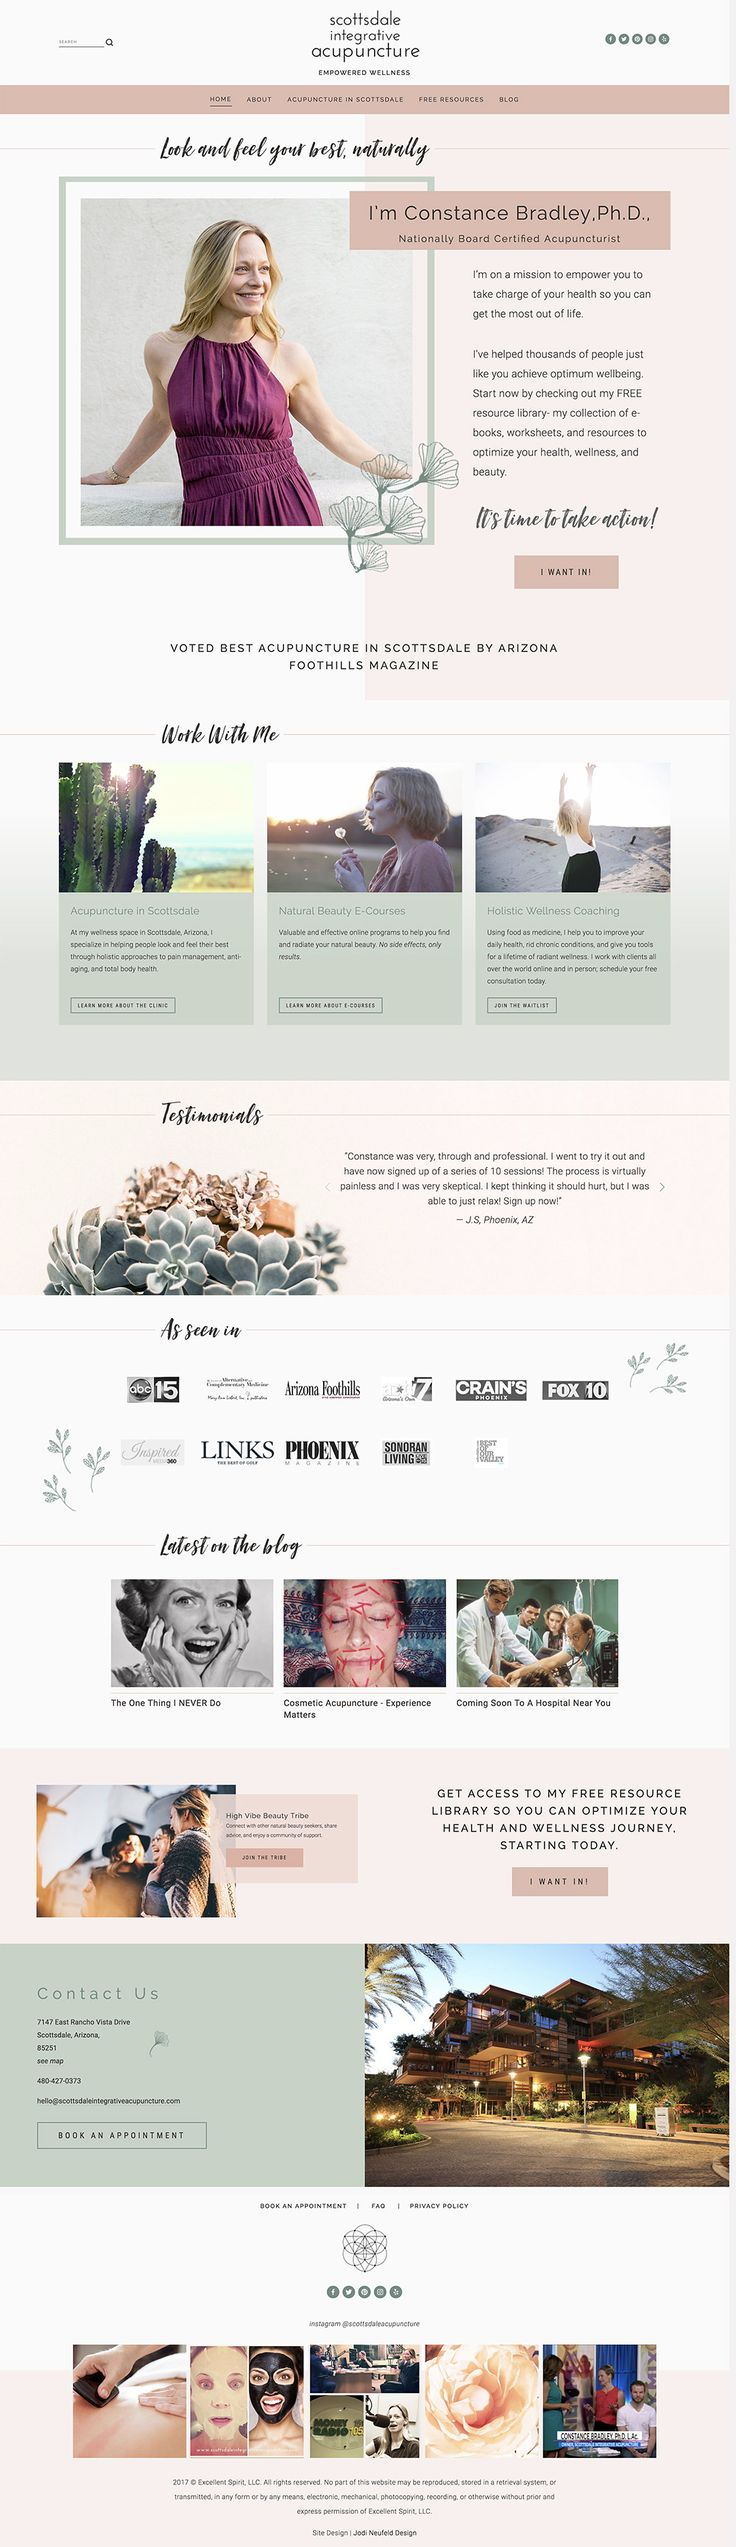 Squarespace web design | Home page for Acupuncture site | Jodi Neufeld Design